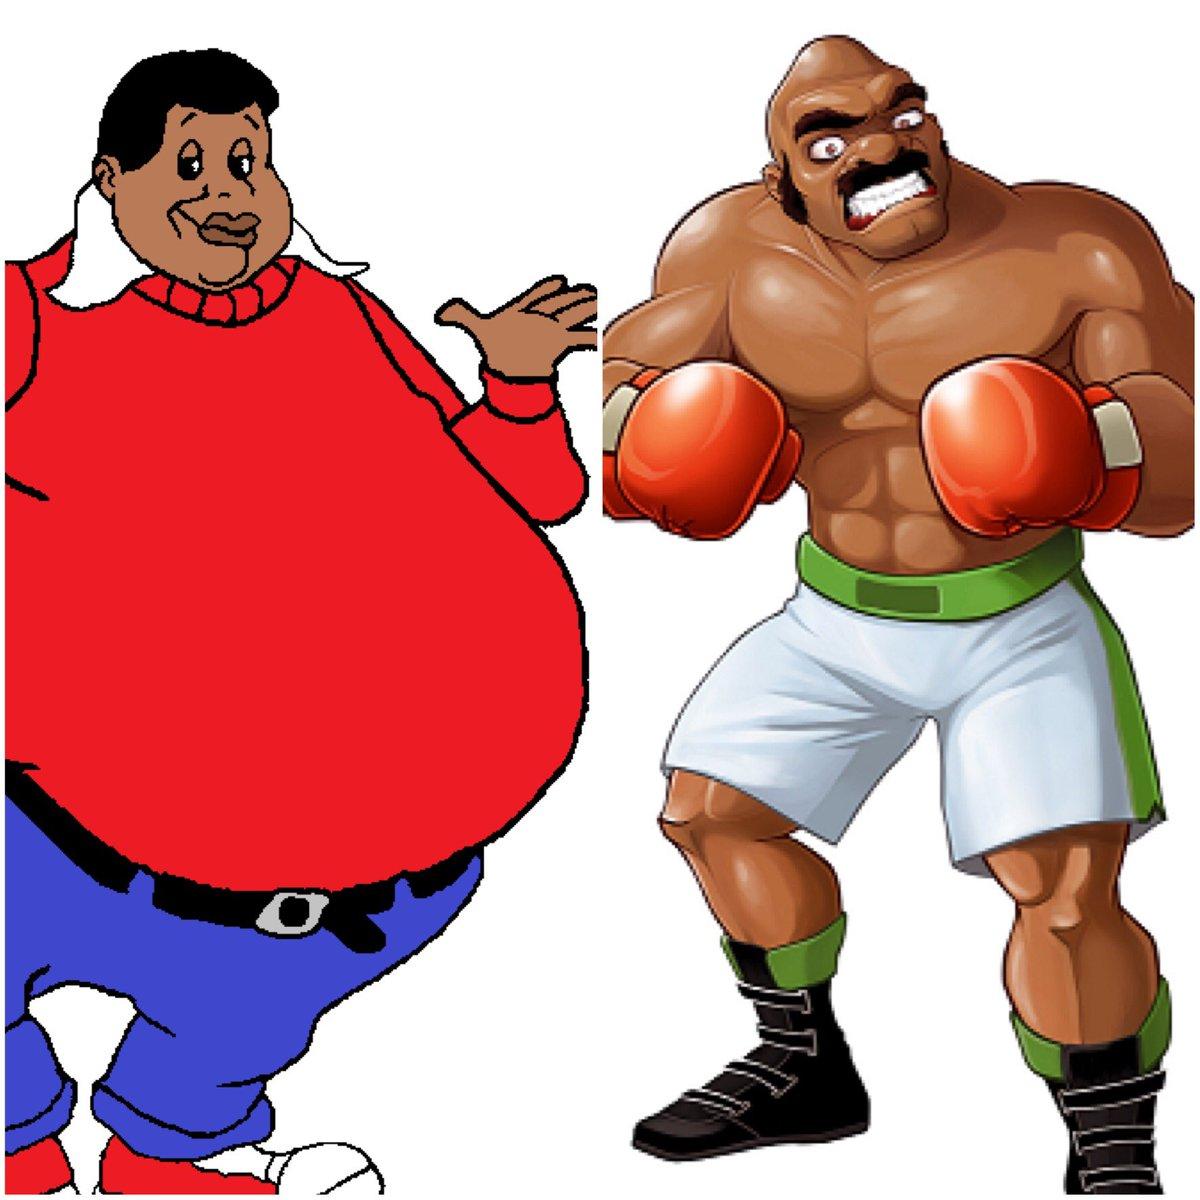 danaunleashed on twitter dada kimbo is what happens if fat albert